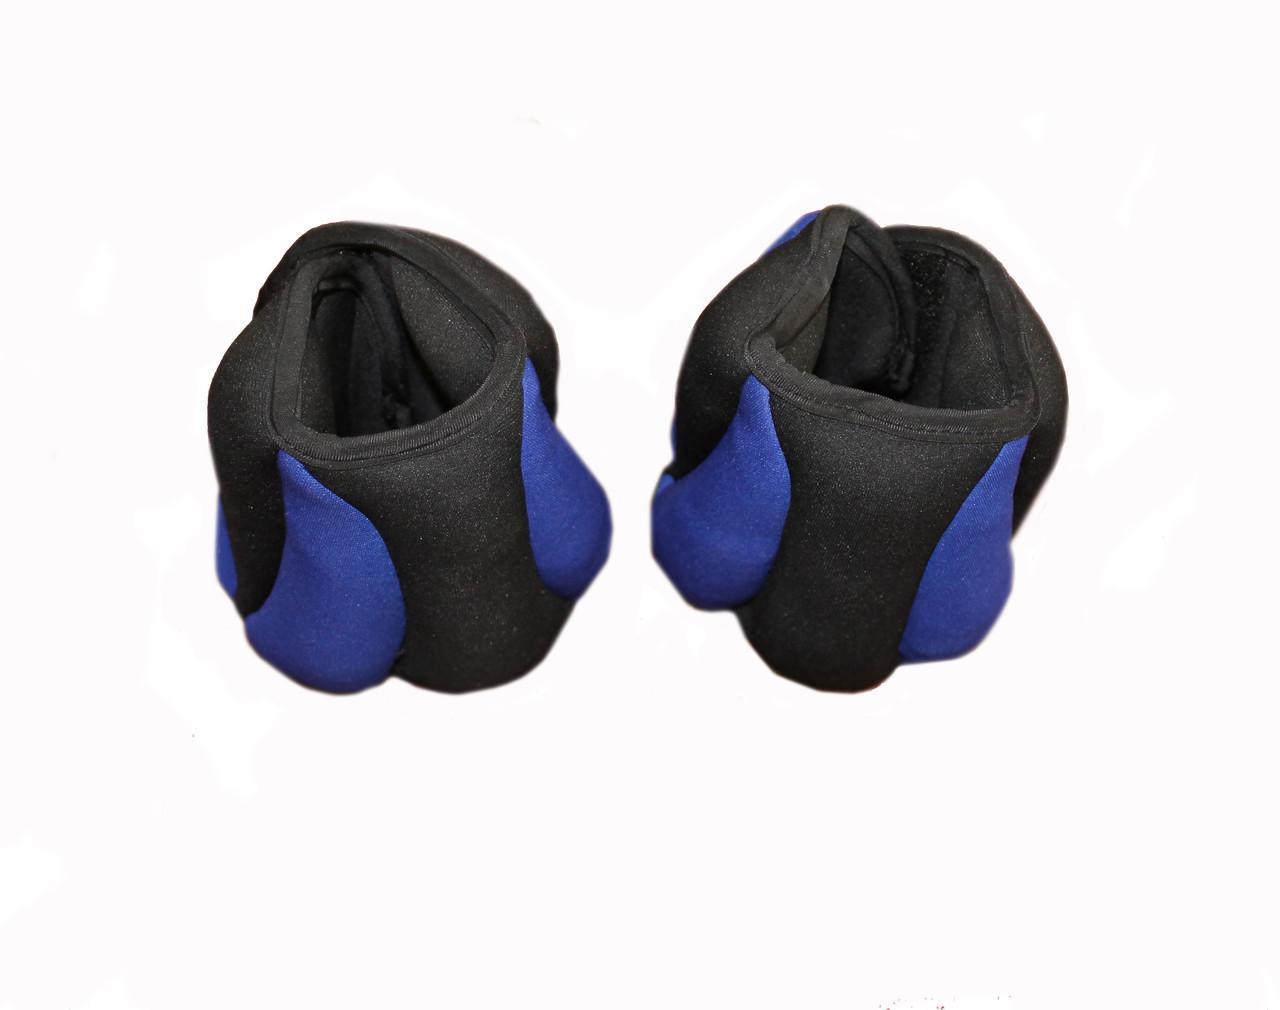 Утяжелители для ног и рук EVROTOP ( 1 кг * 2 шт) неопрен SS-LKW-1211 1кг (Утяжелители для ног и рук EVROTOP ( 1 кг * 2 шт) неопрен SS-LKW-1211 1кг)